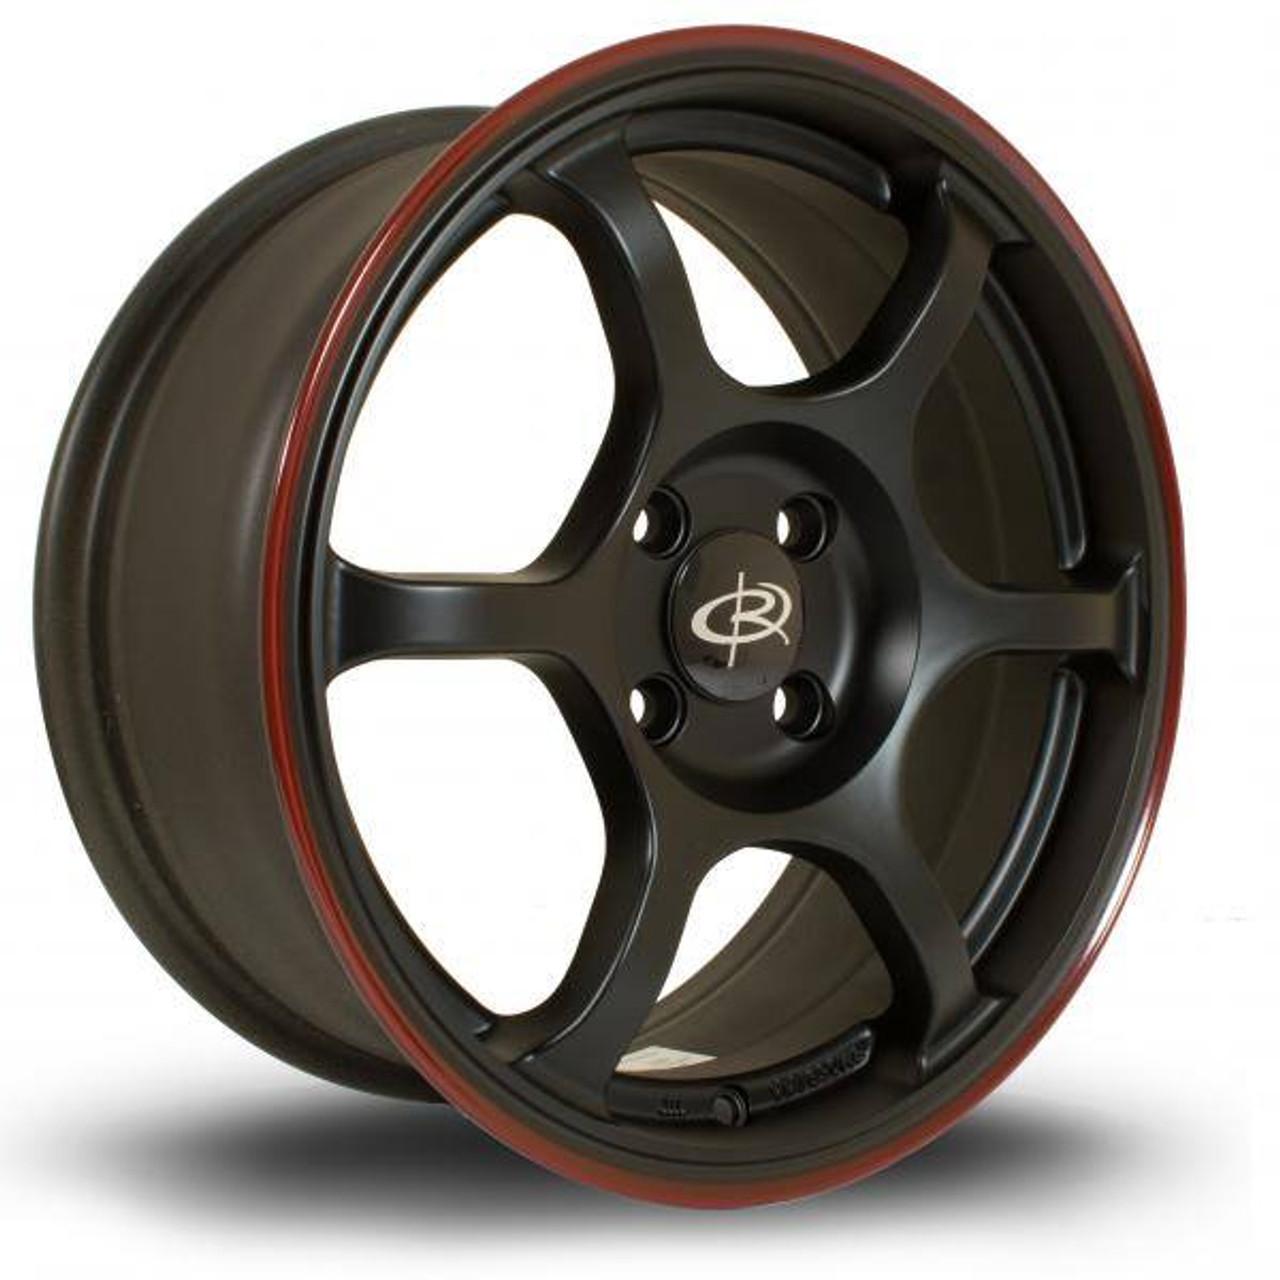 Rota Boost Alloy Wheels Blackrlip